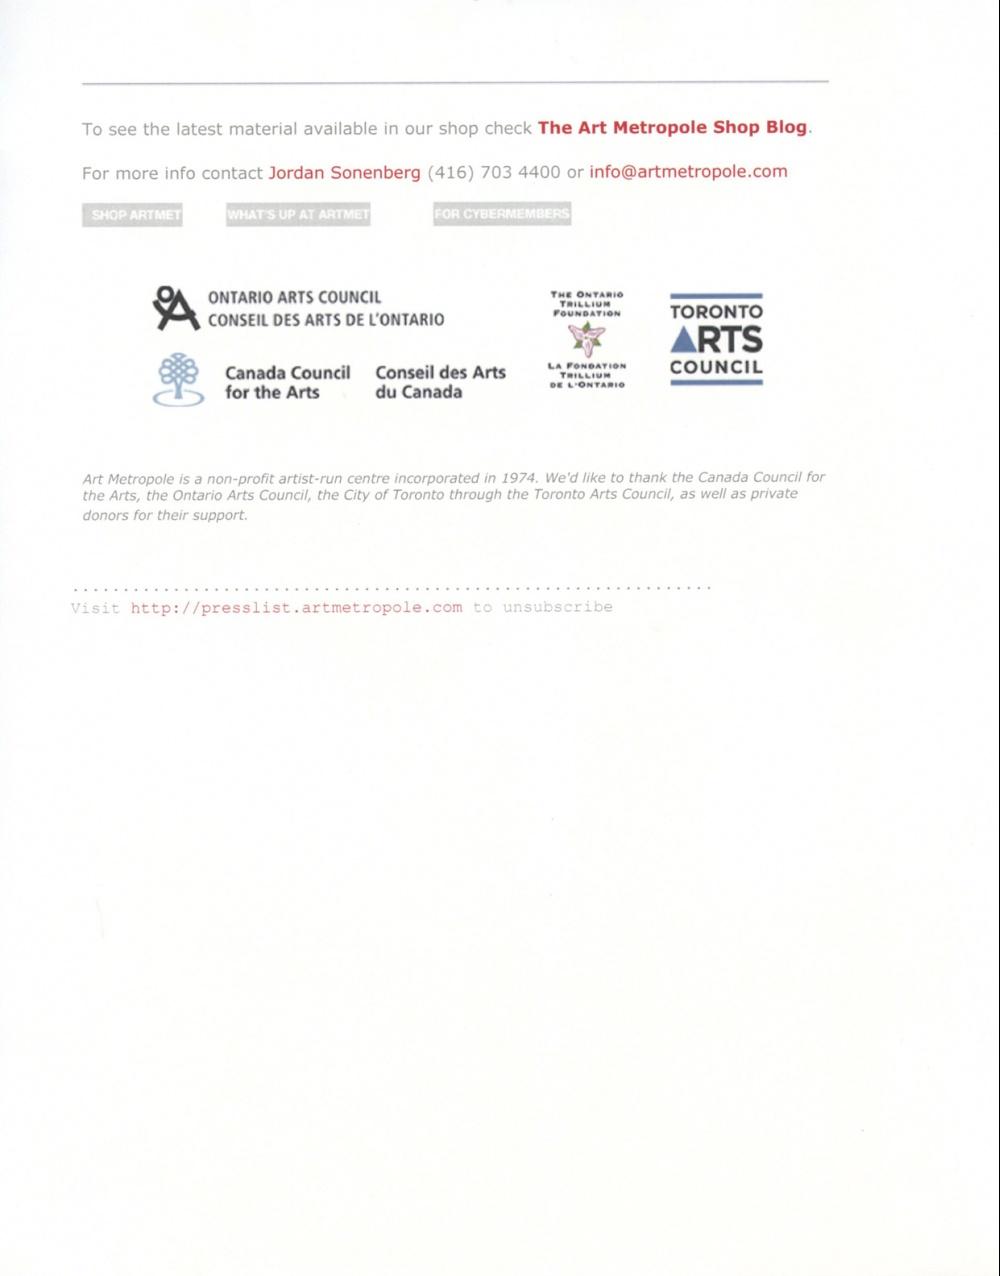 AMA1106.1, page 4